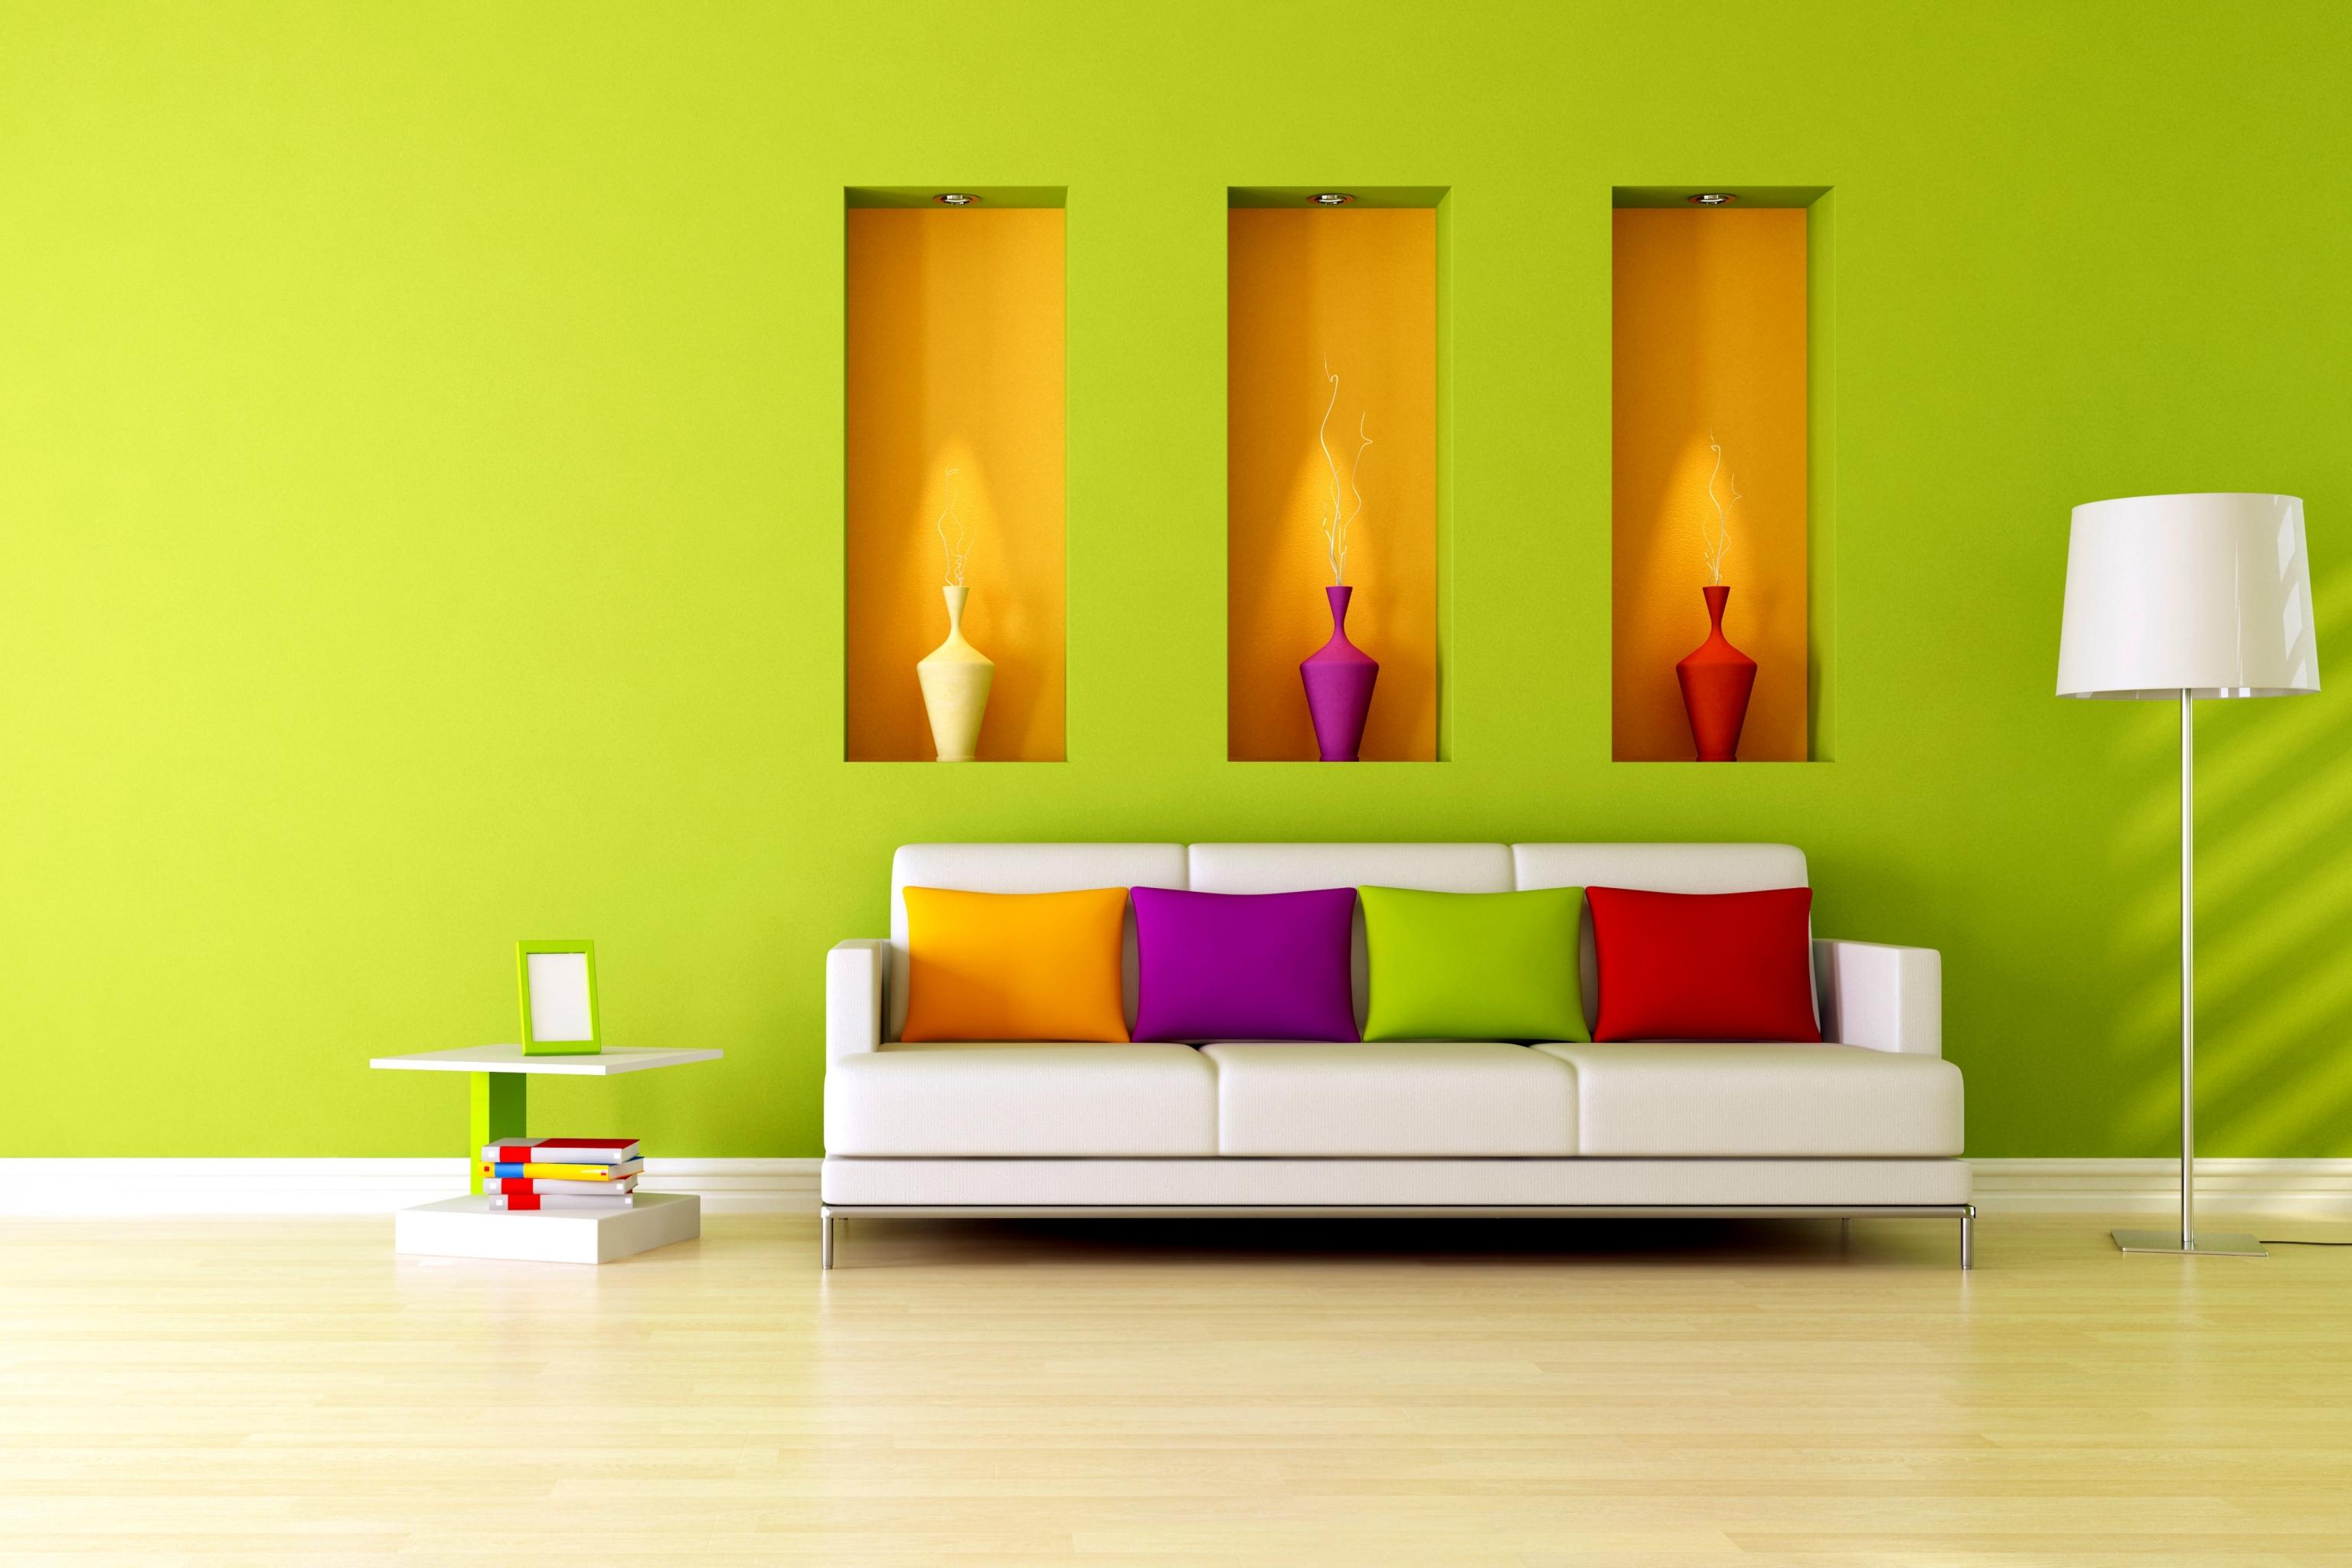 Wallpaper 579038